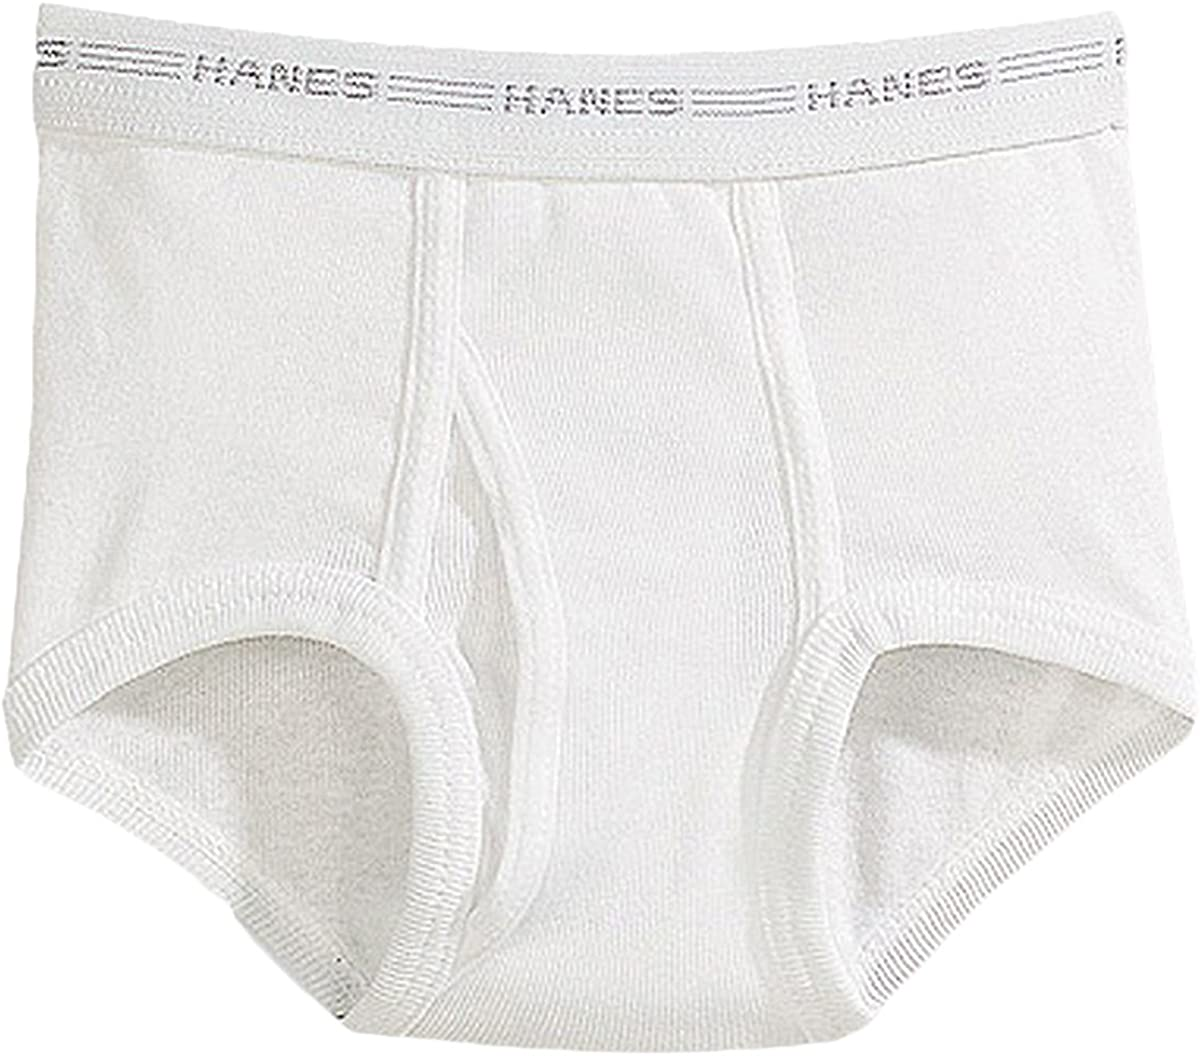 Hanes Boys White Briefs Value 6-Pack_White_X-Small